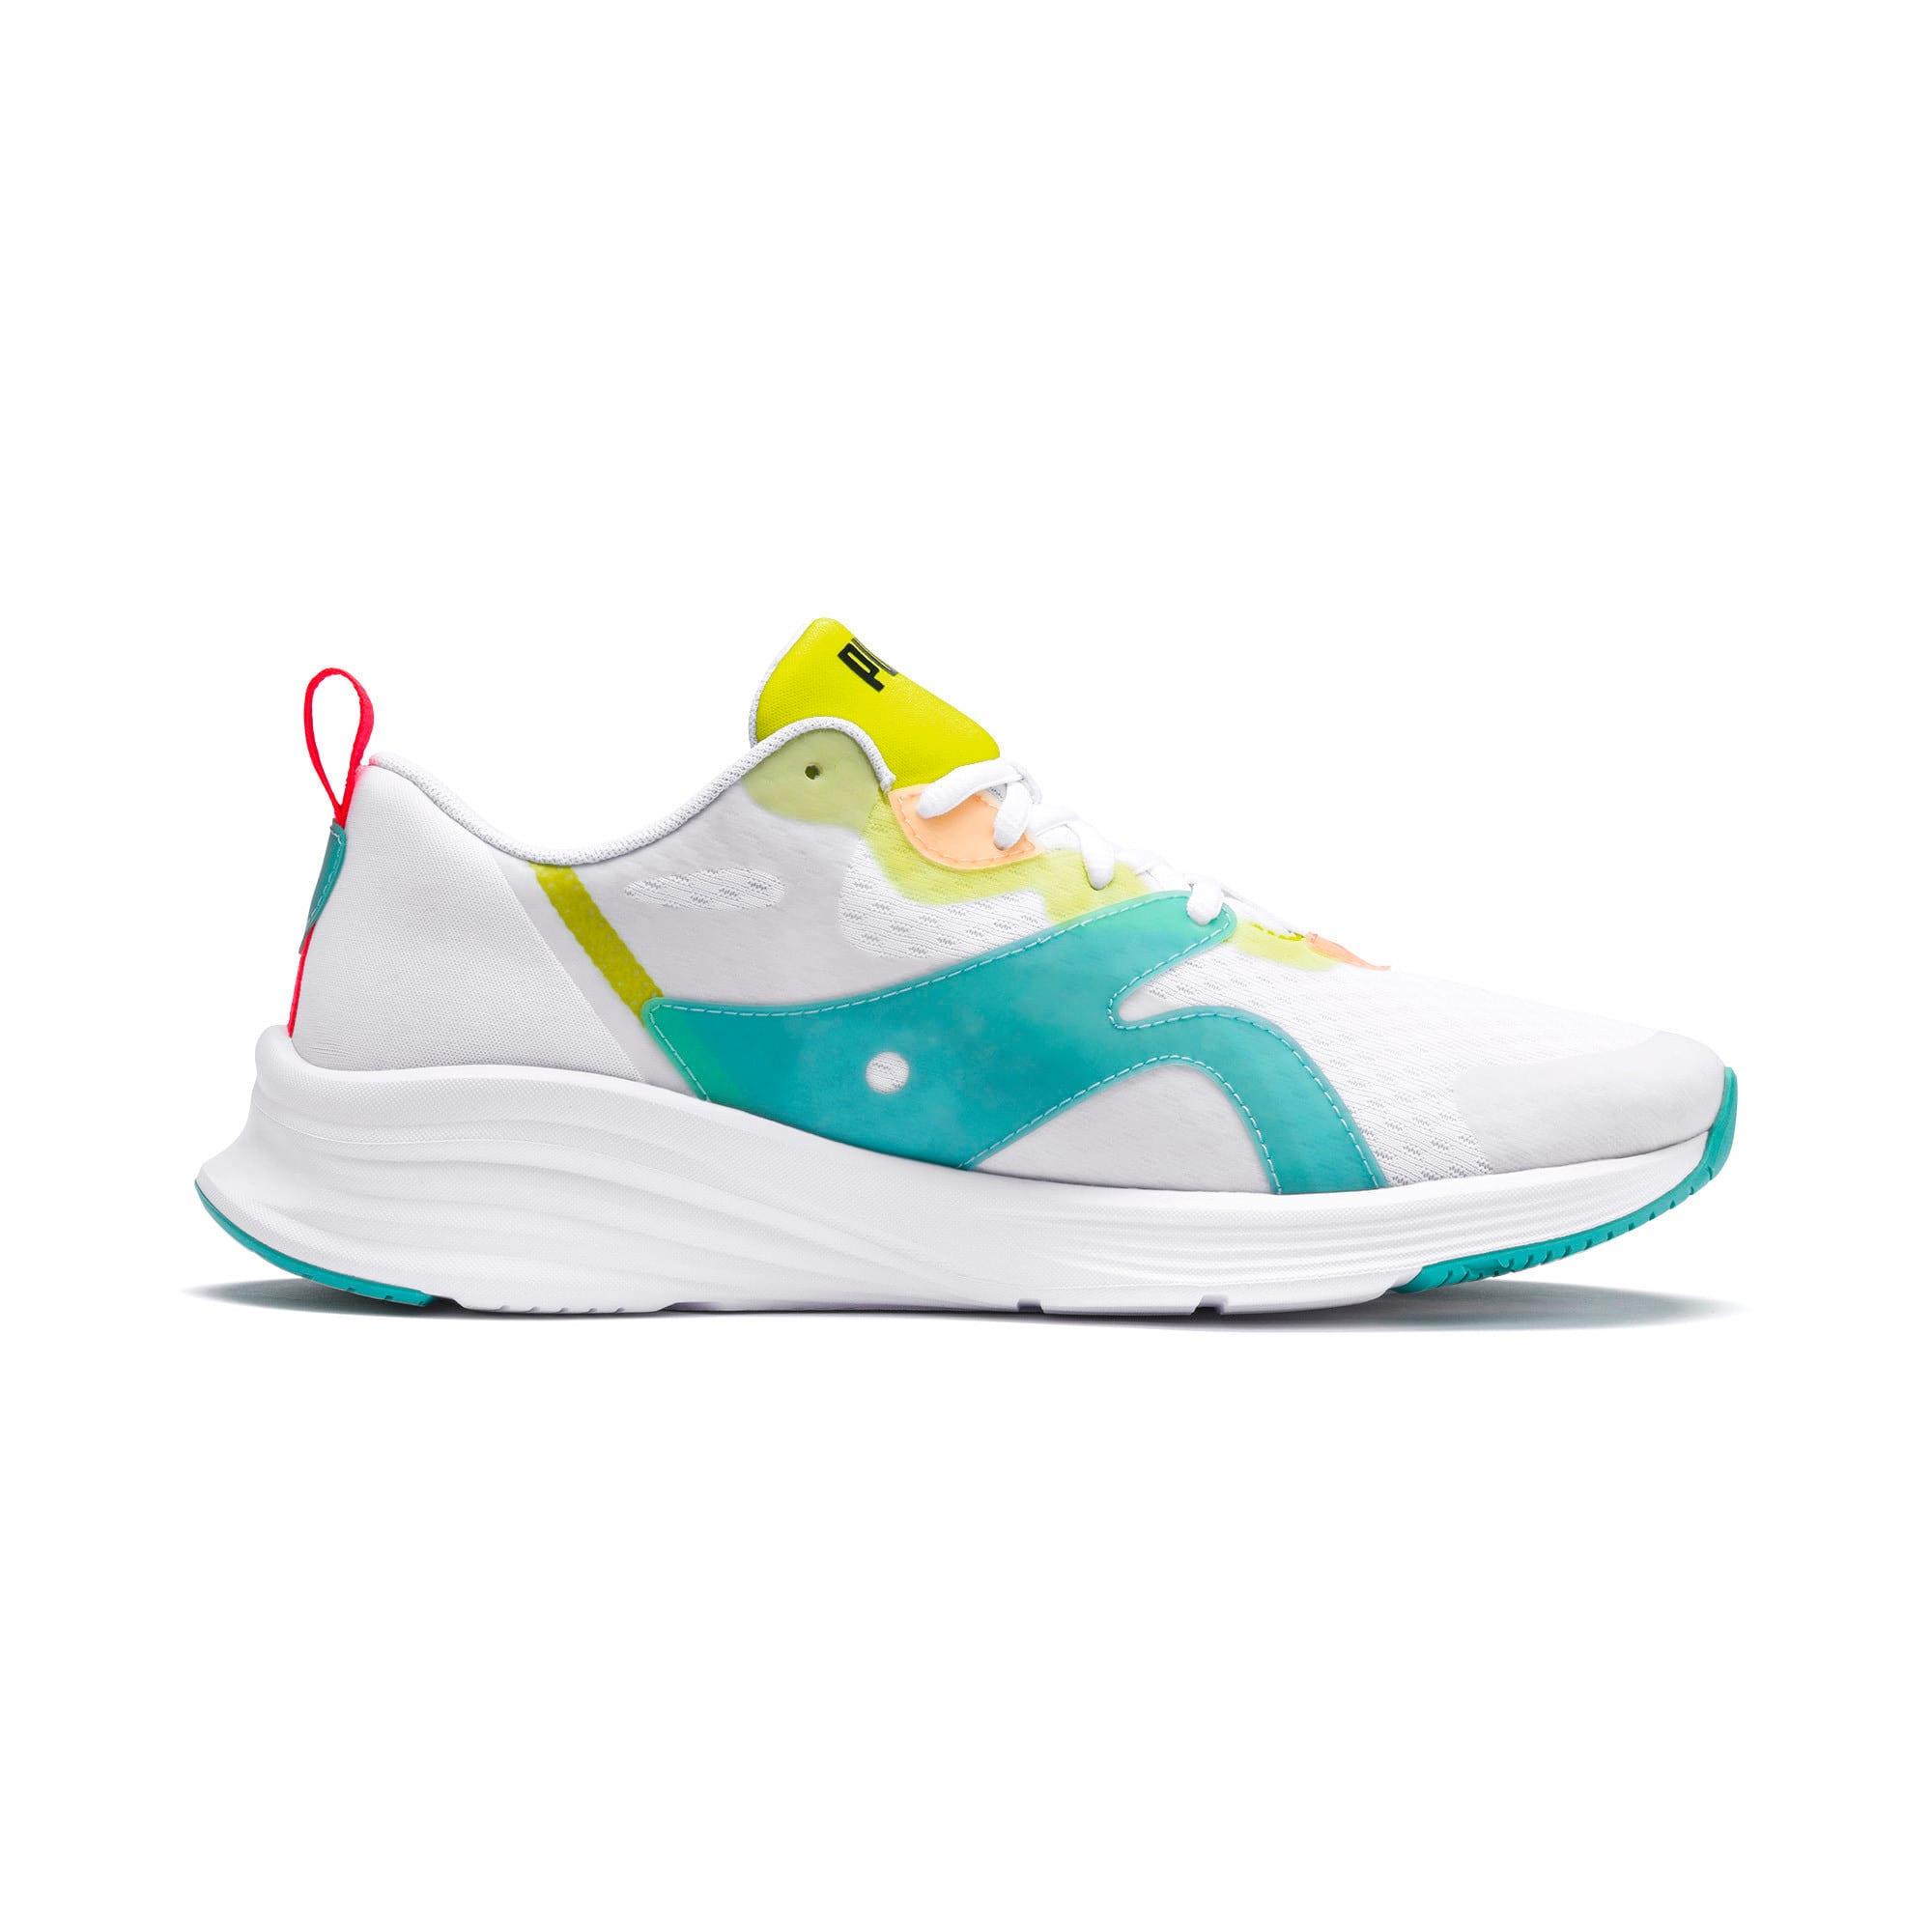 Thumbnail 5 of HYBRID Fuego Men's Running Shoes, White-Nrgy Rose-Yellow Alert, medium